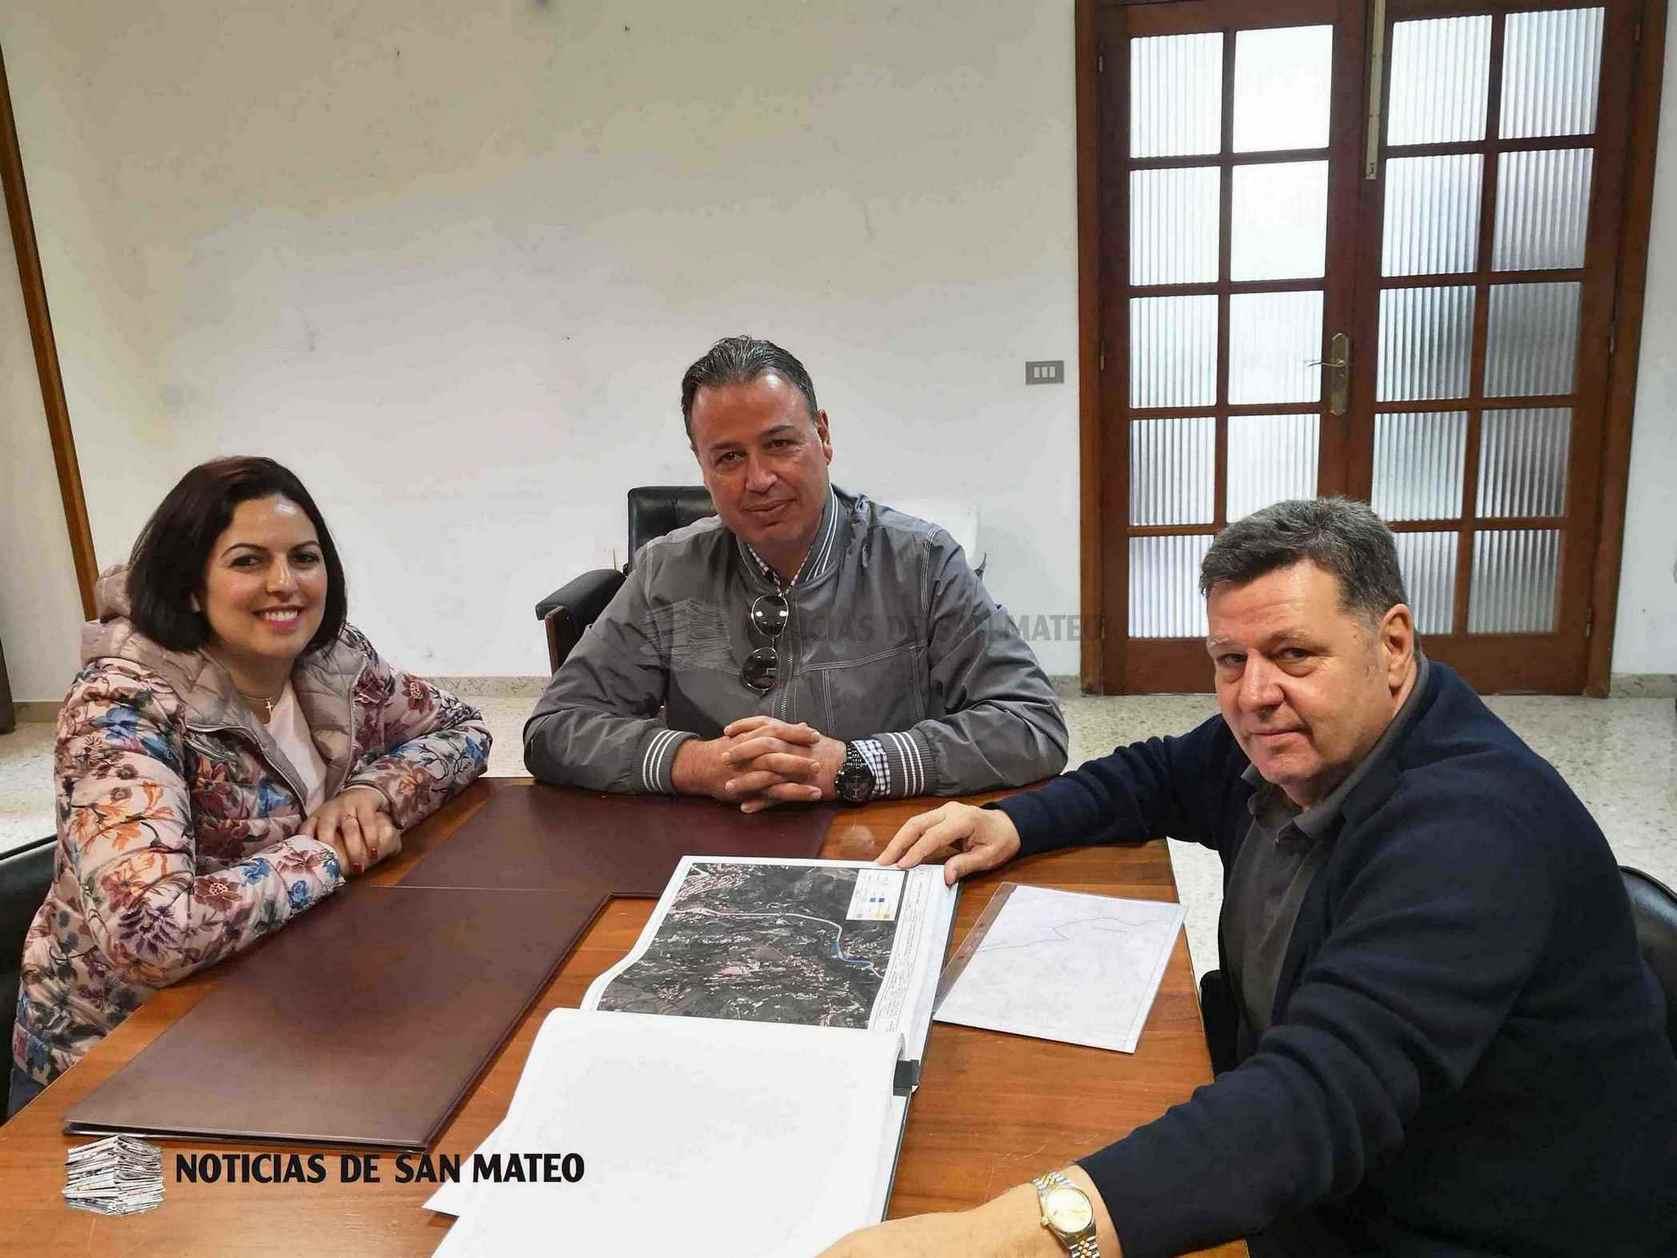 Reunion Estudio Alternativa a la gc 15 15 de febrero de 2019 noticias de san mateo